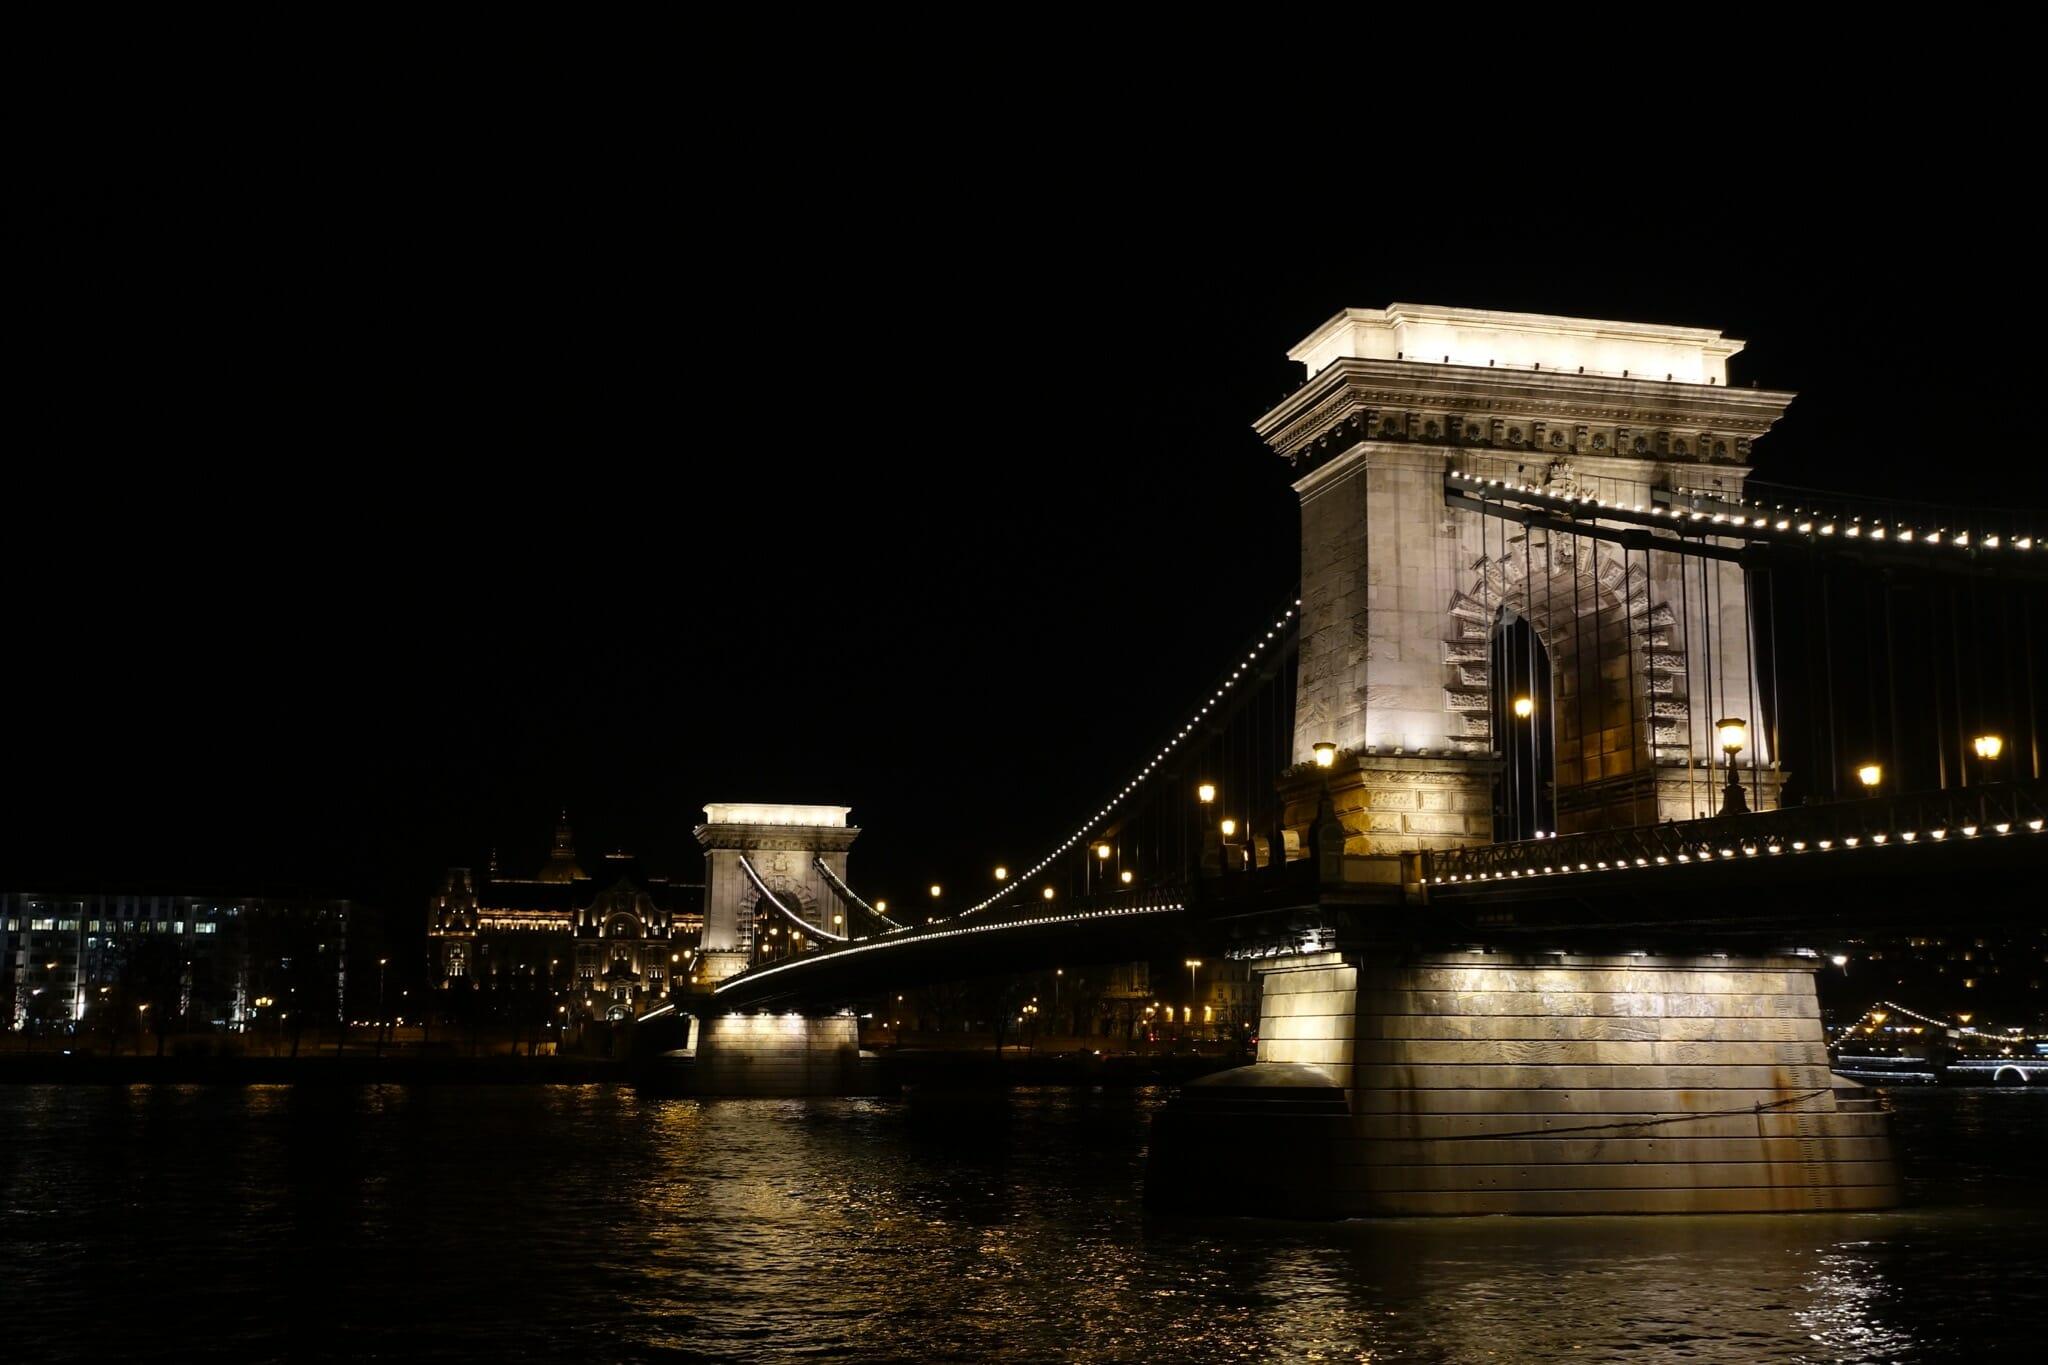 The Chain Bridge illuminated at night